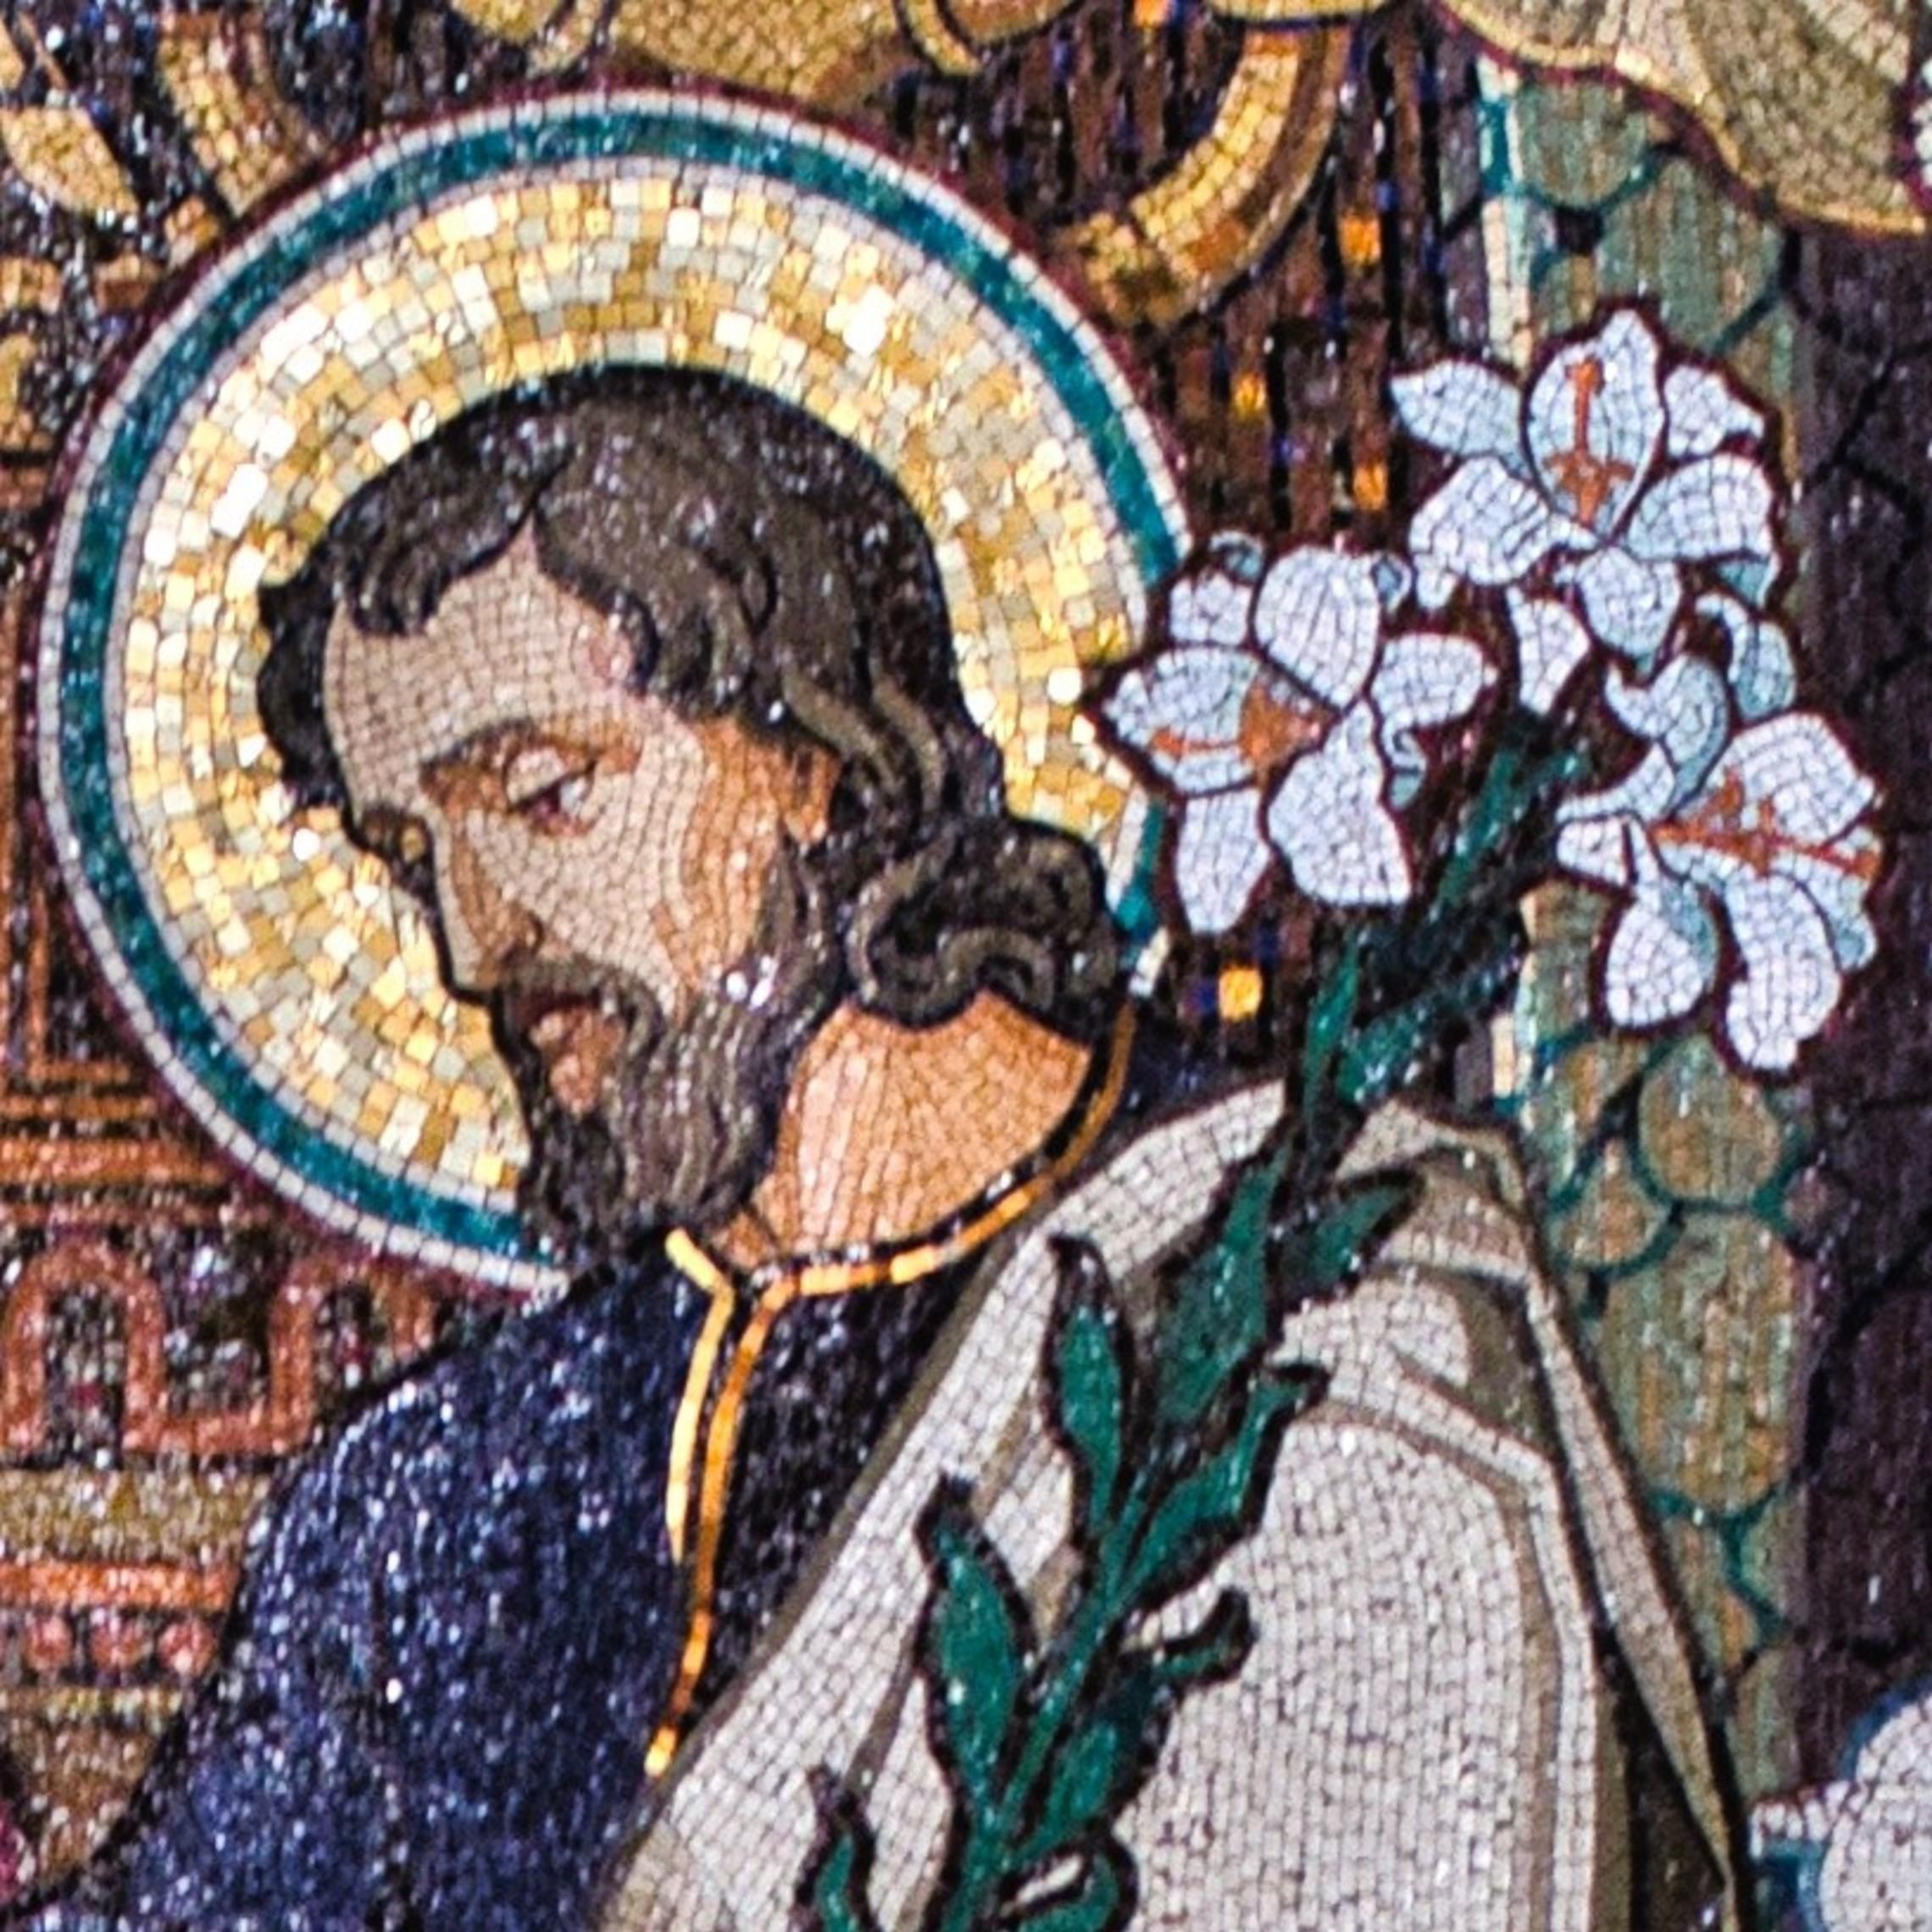 St. Jospeh Mosaic